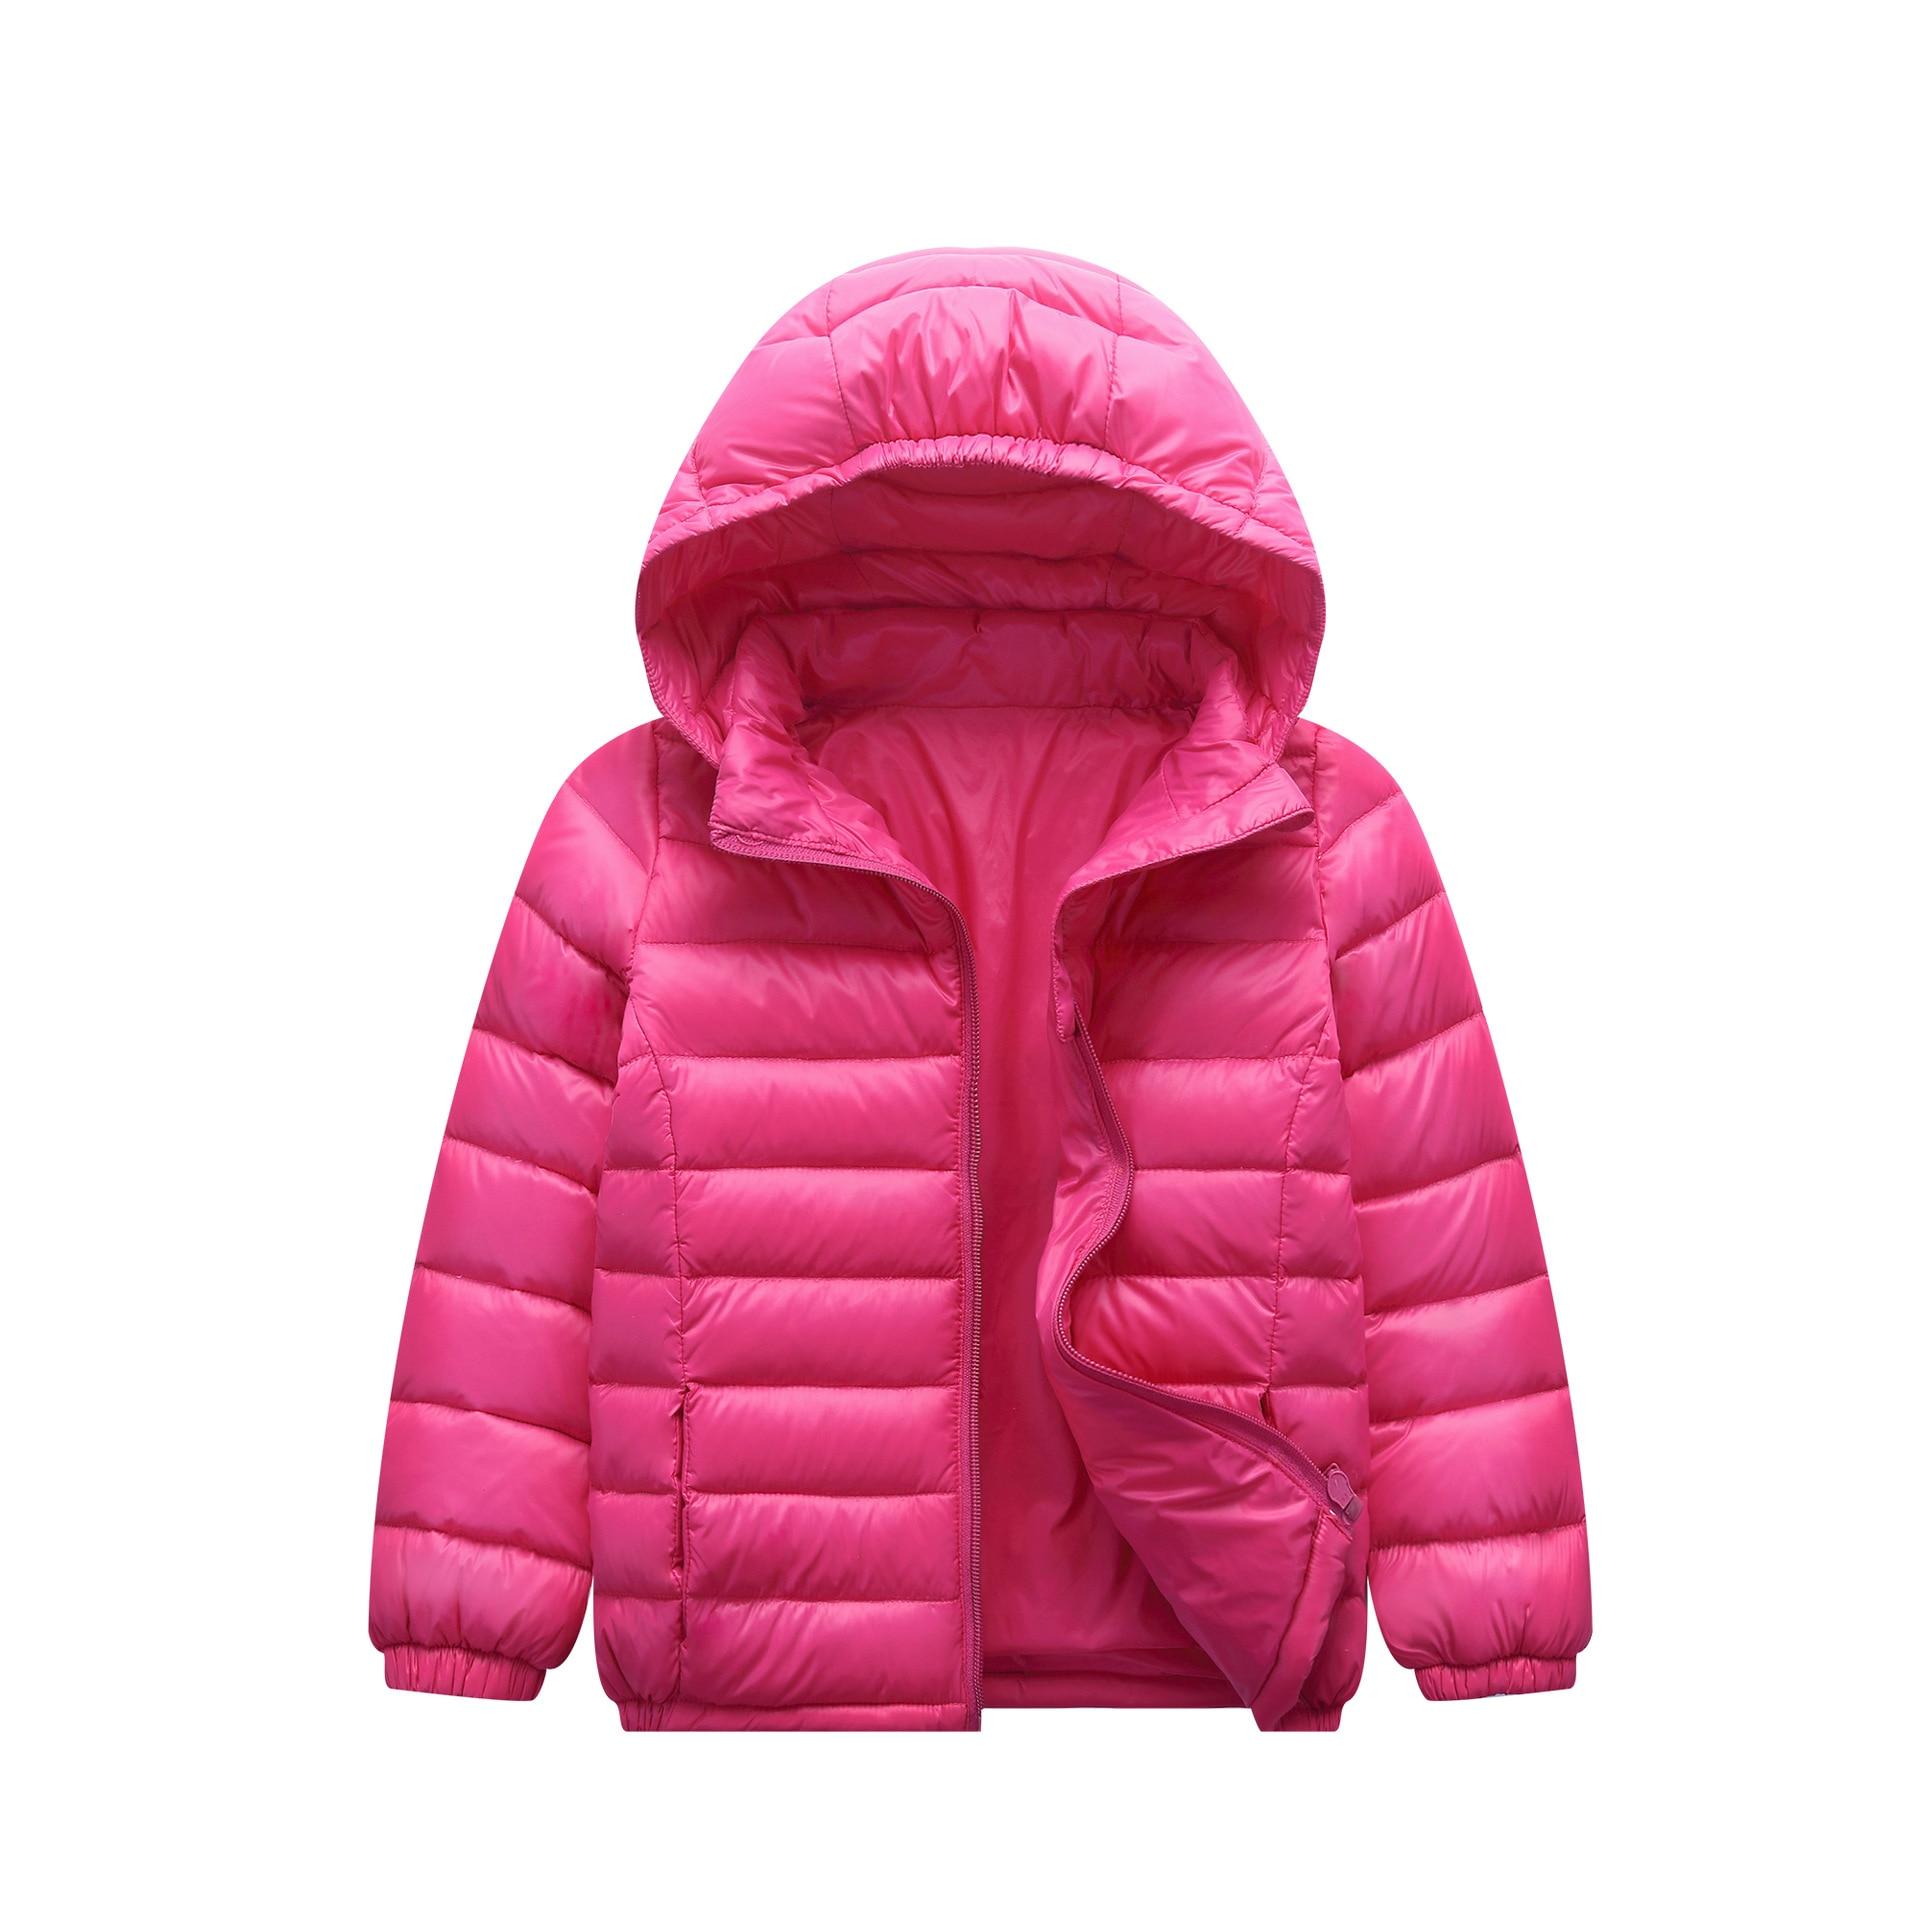 2021New Fashion children jacket Outerwear Boy and Girl autumn Warm Down Hooded Coat teenage parka kids winter jacket